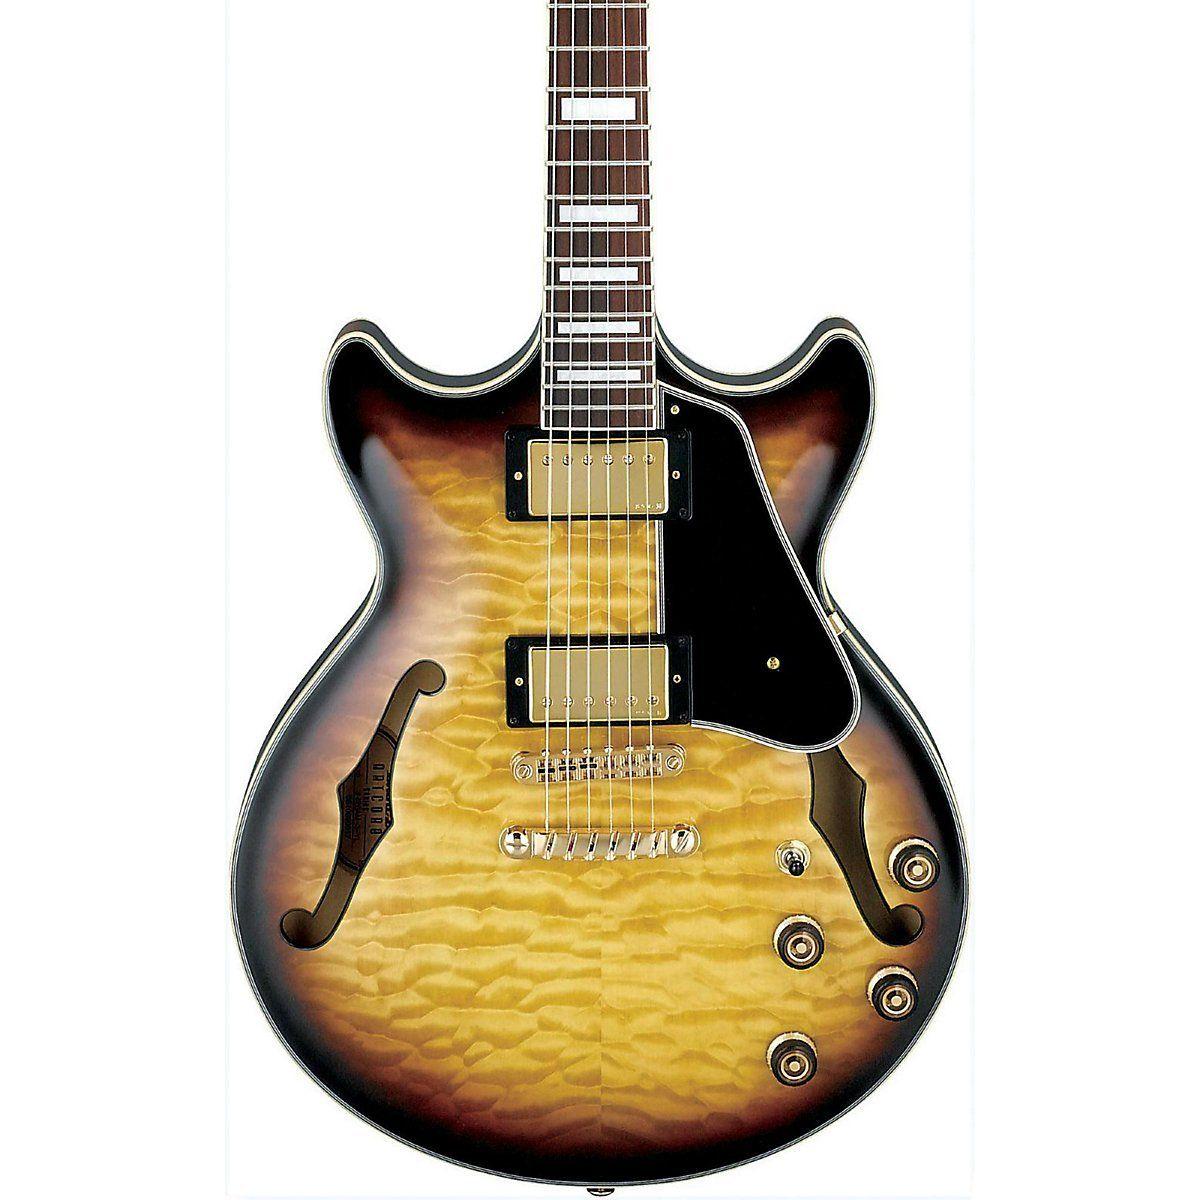 Amazon Com Ibanez Am93ays Artcore Expressionist Semi Hollow Electric Guitar Yellow Sunburst Musical Instruments Electric Guitar Guitar Artcore